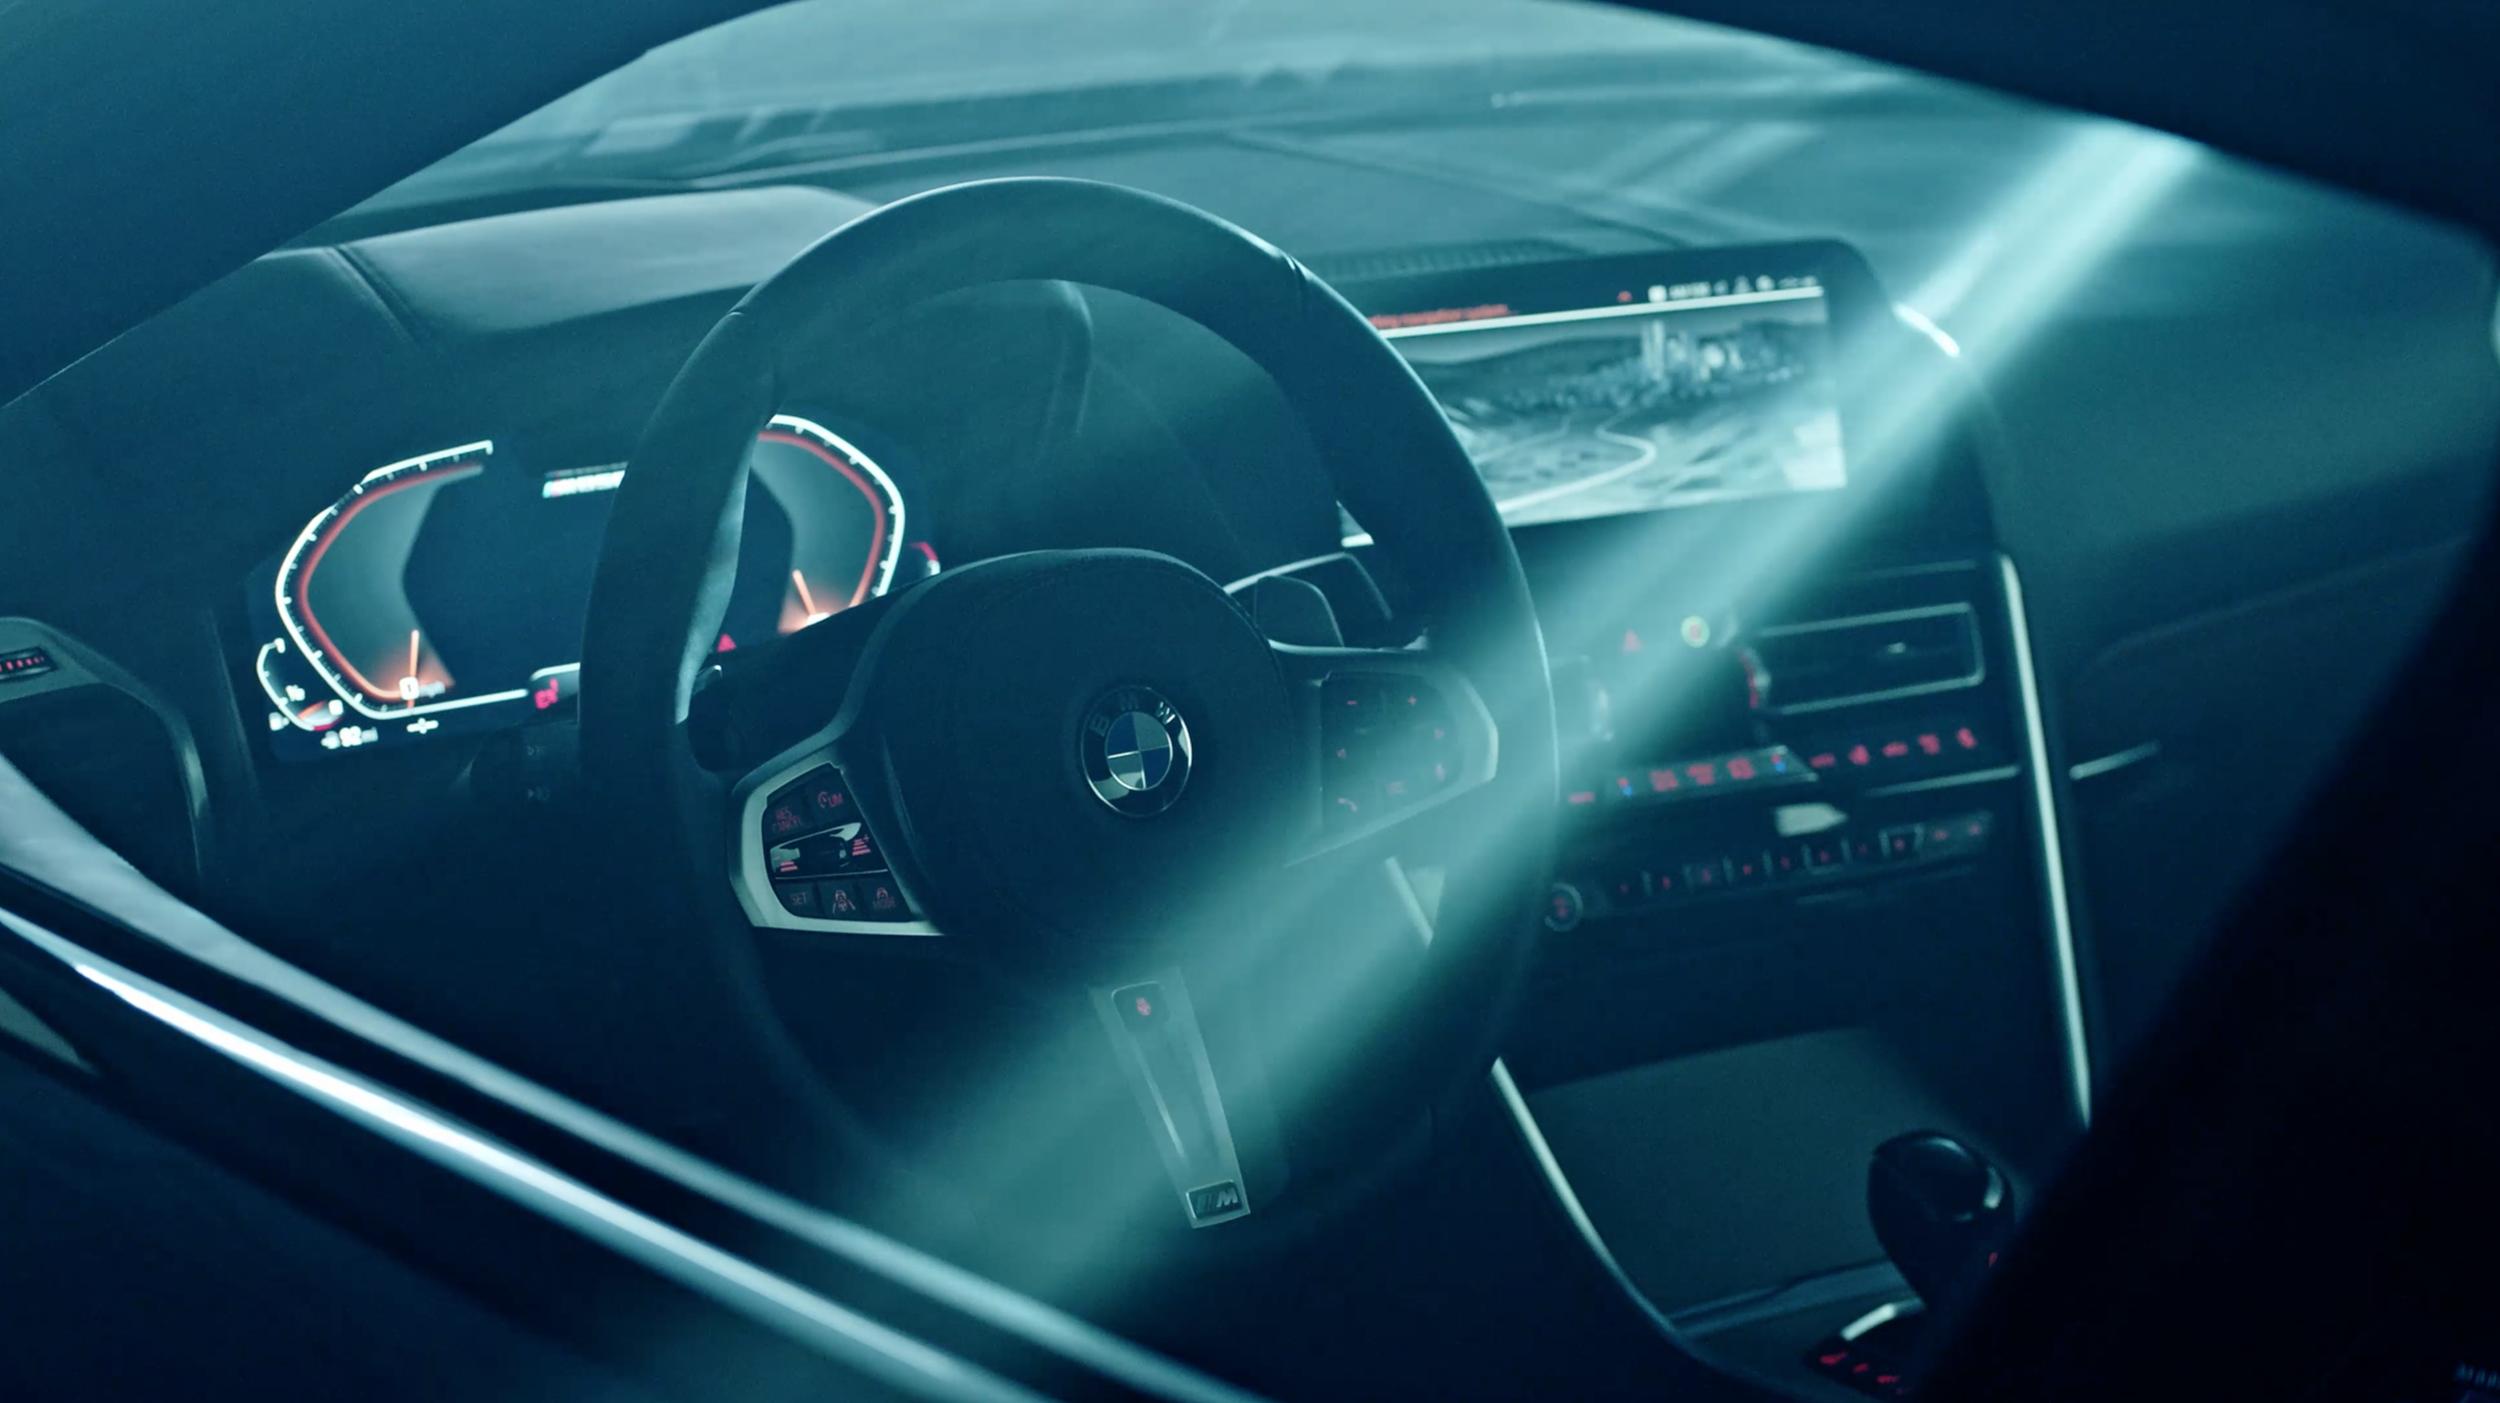 BMW 8 Series commercial shot in Studio 2.